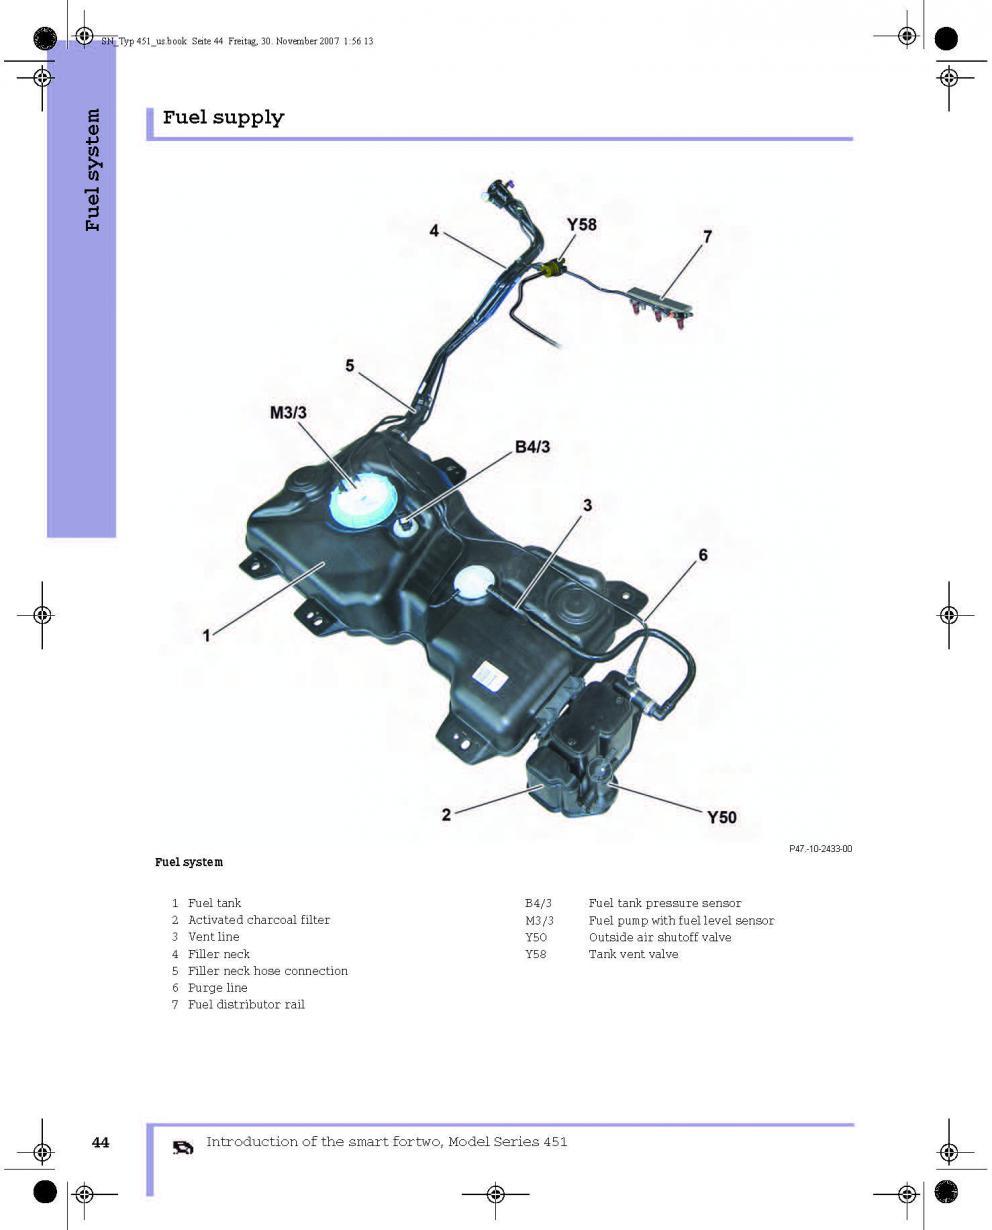 2008 Smart Fortwo Wiring Diagram Electrical Diagrams Fuse Box On A Car Fuel Pump Schematics Data U2022 Custom